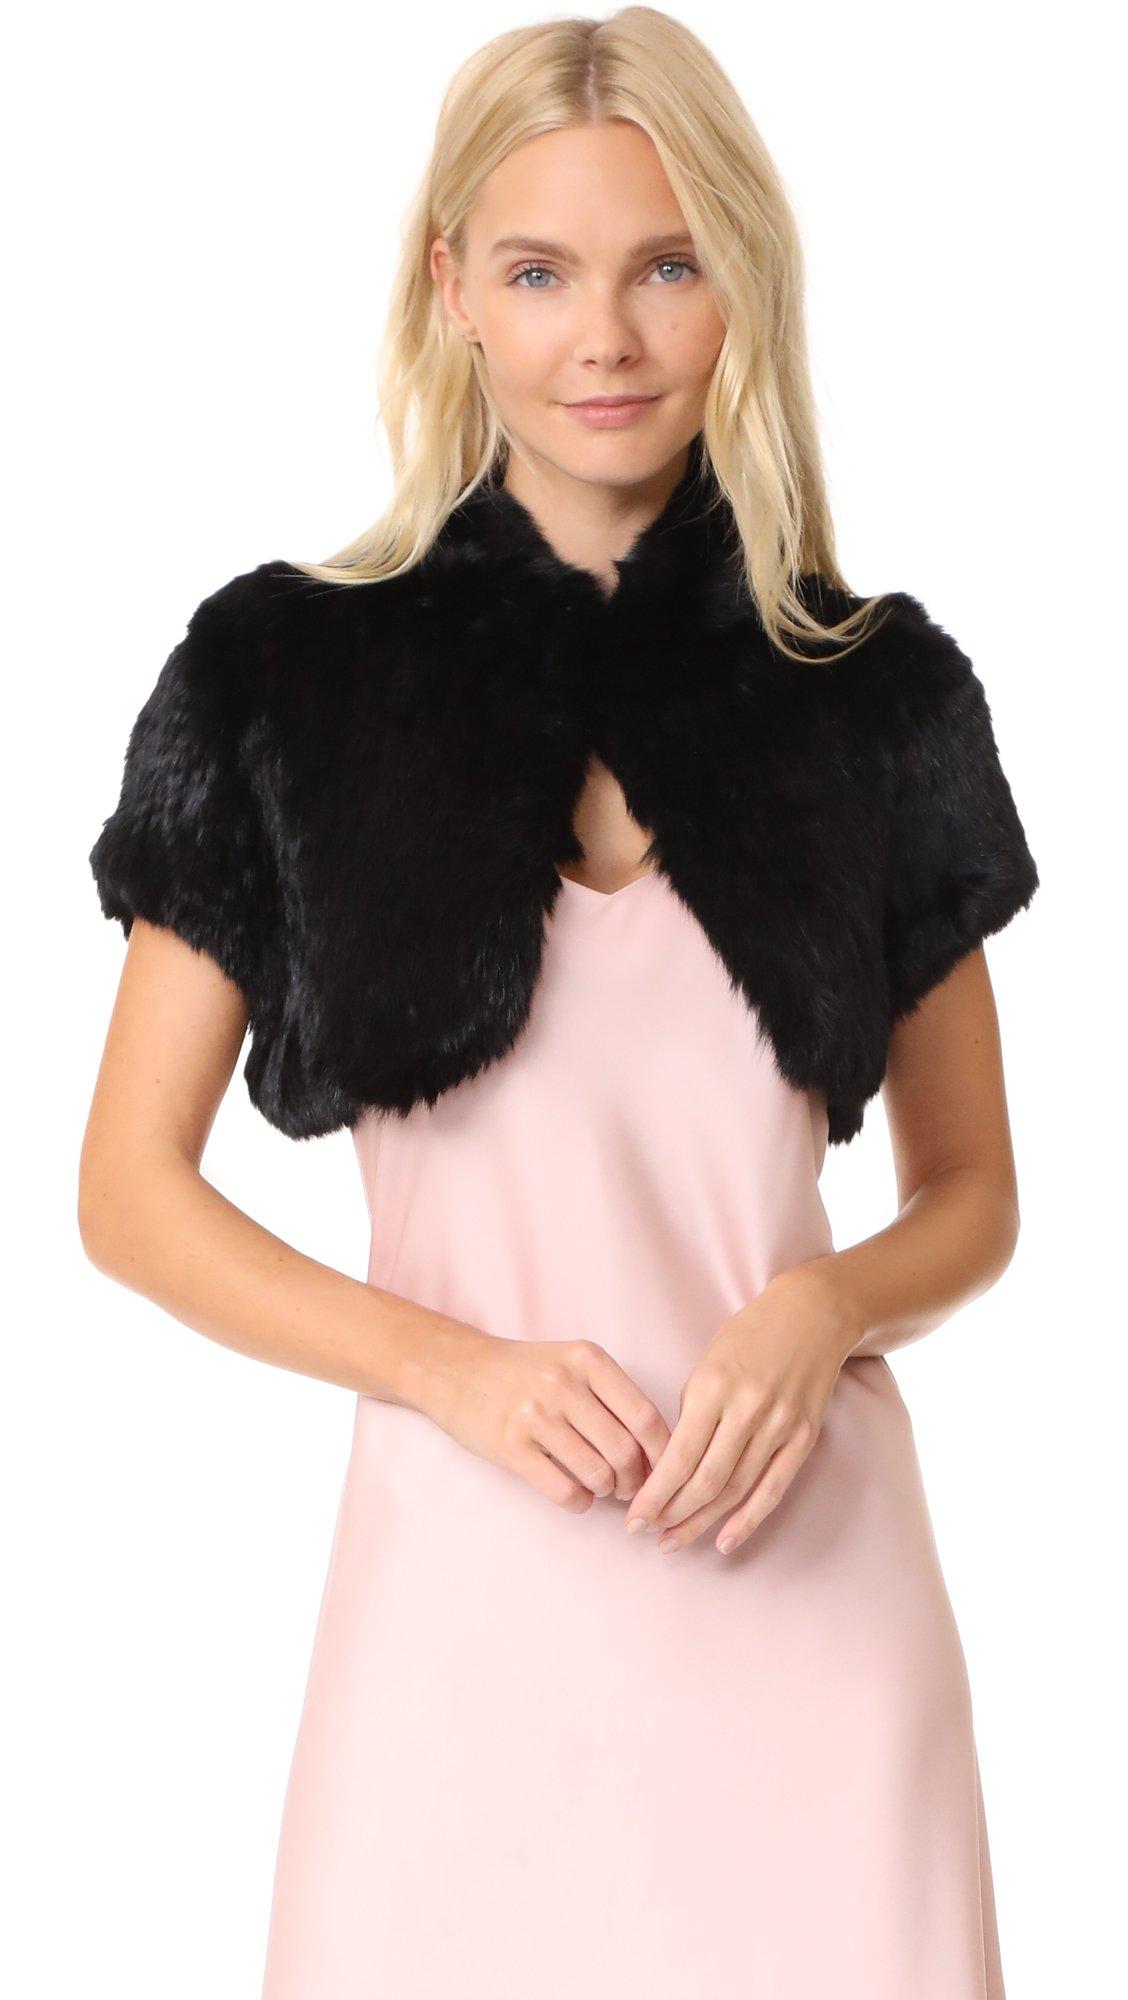 Jocelyn Women's Fur Shrug, Black, Medium